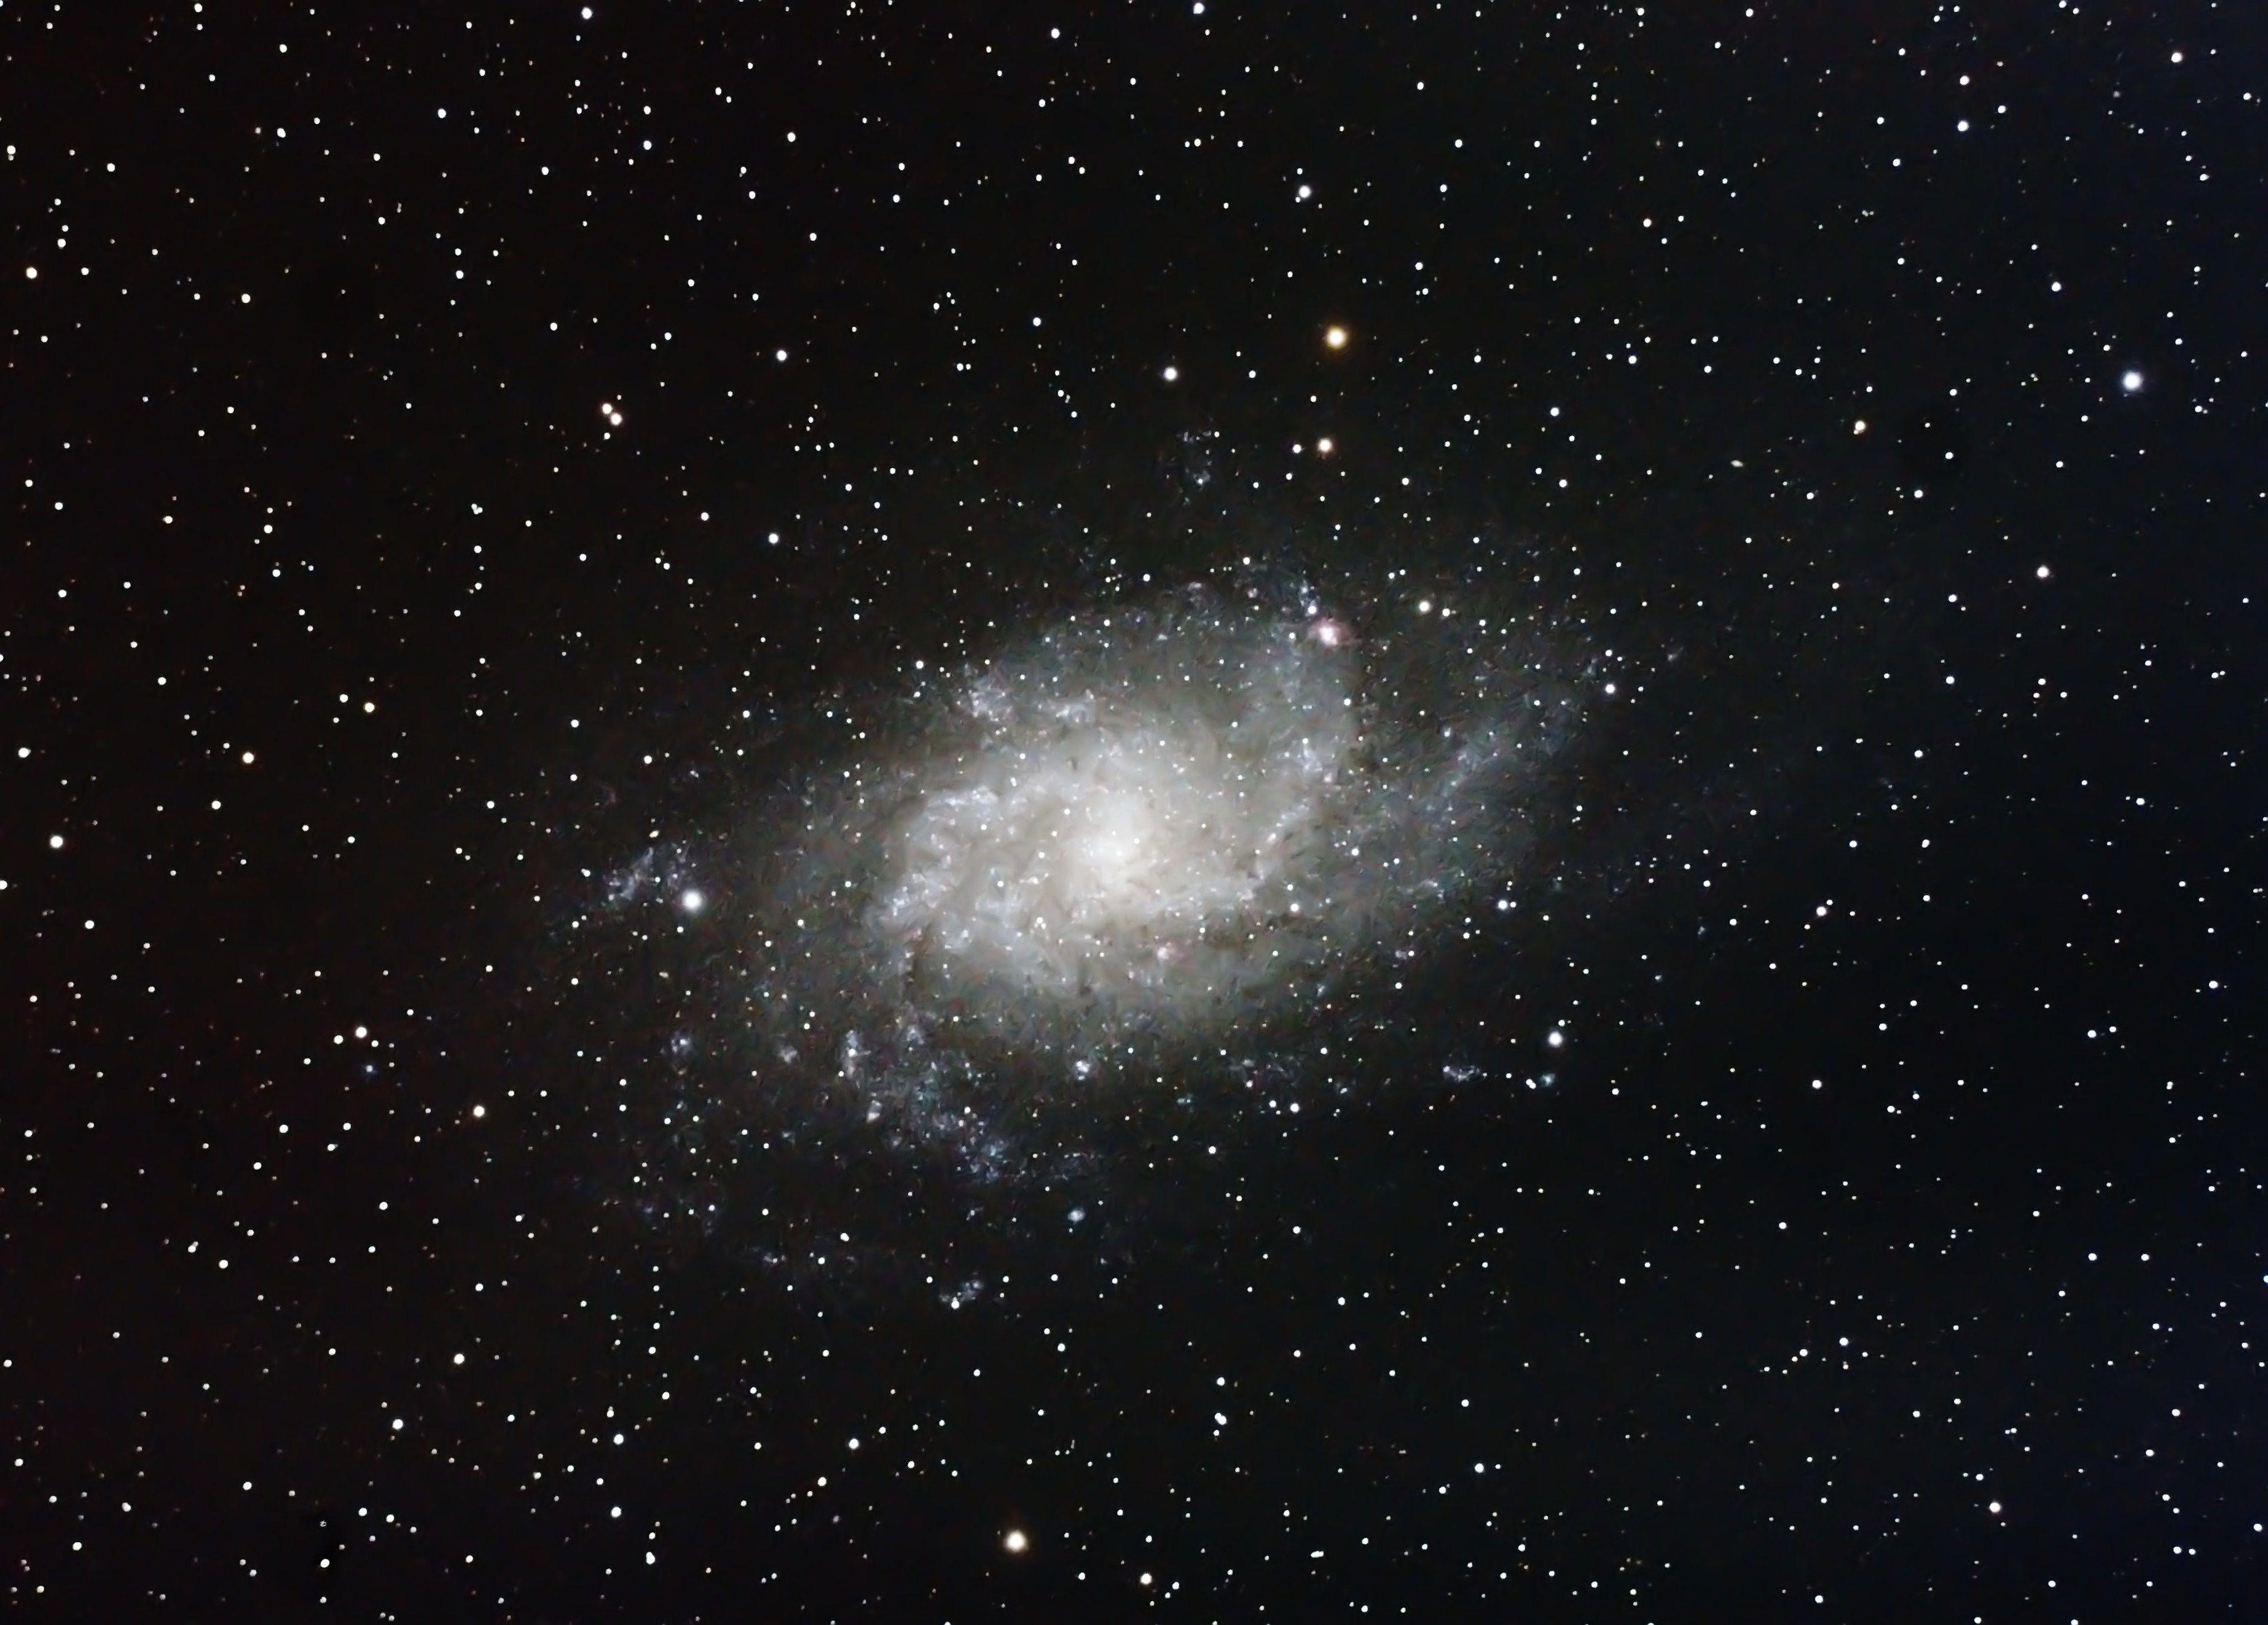 M33 - The Pinwheel Galaxy